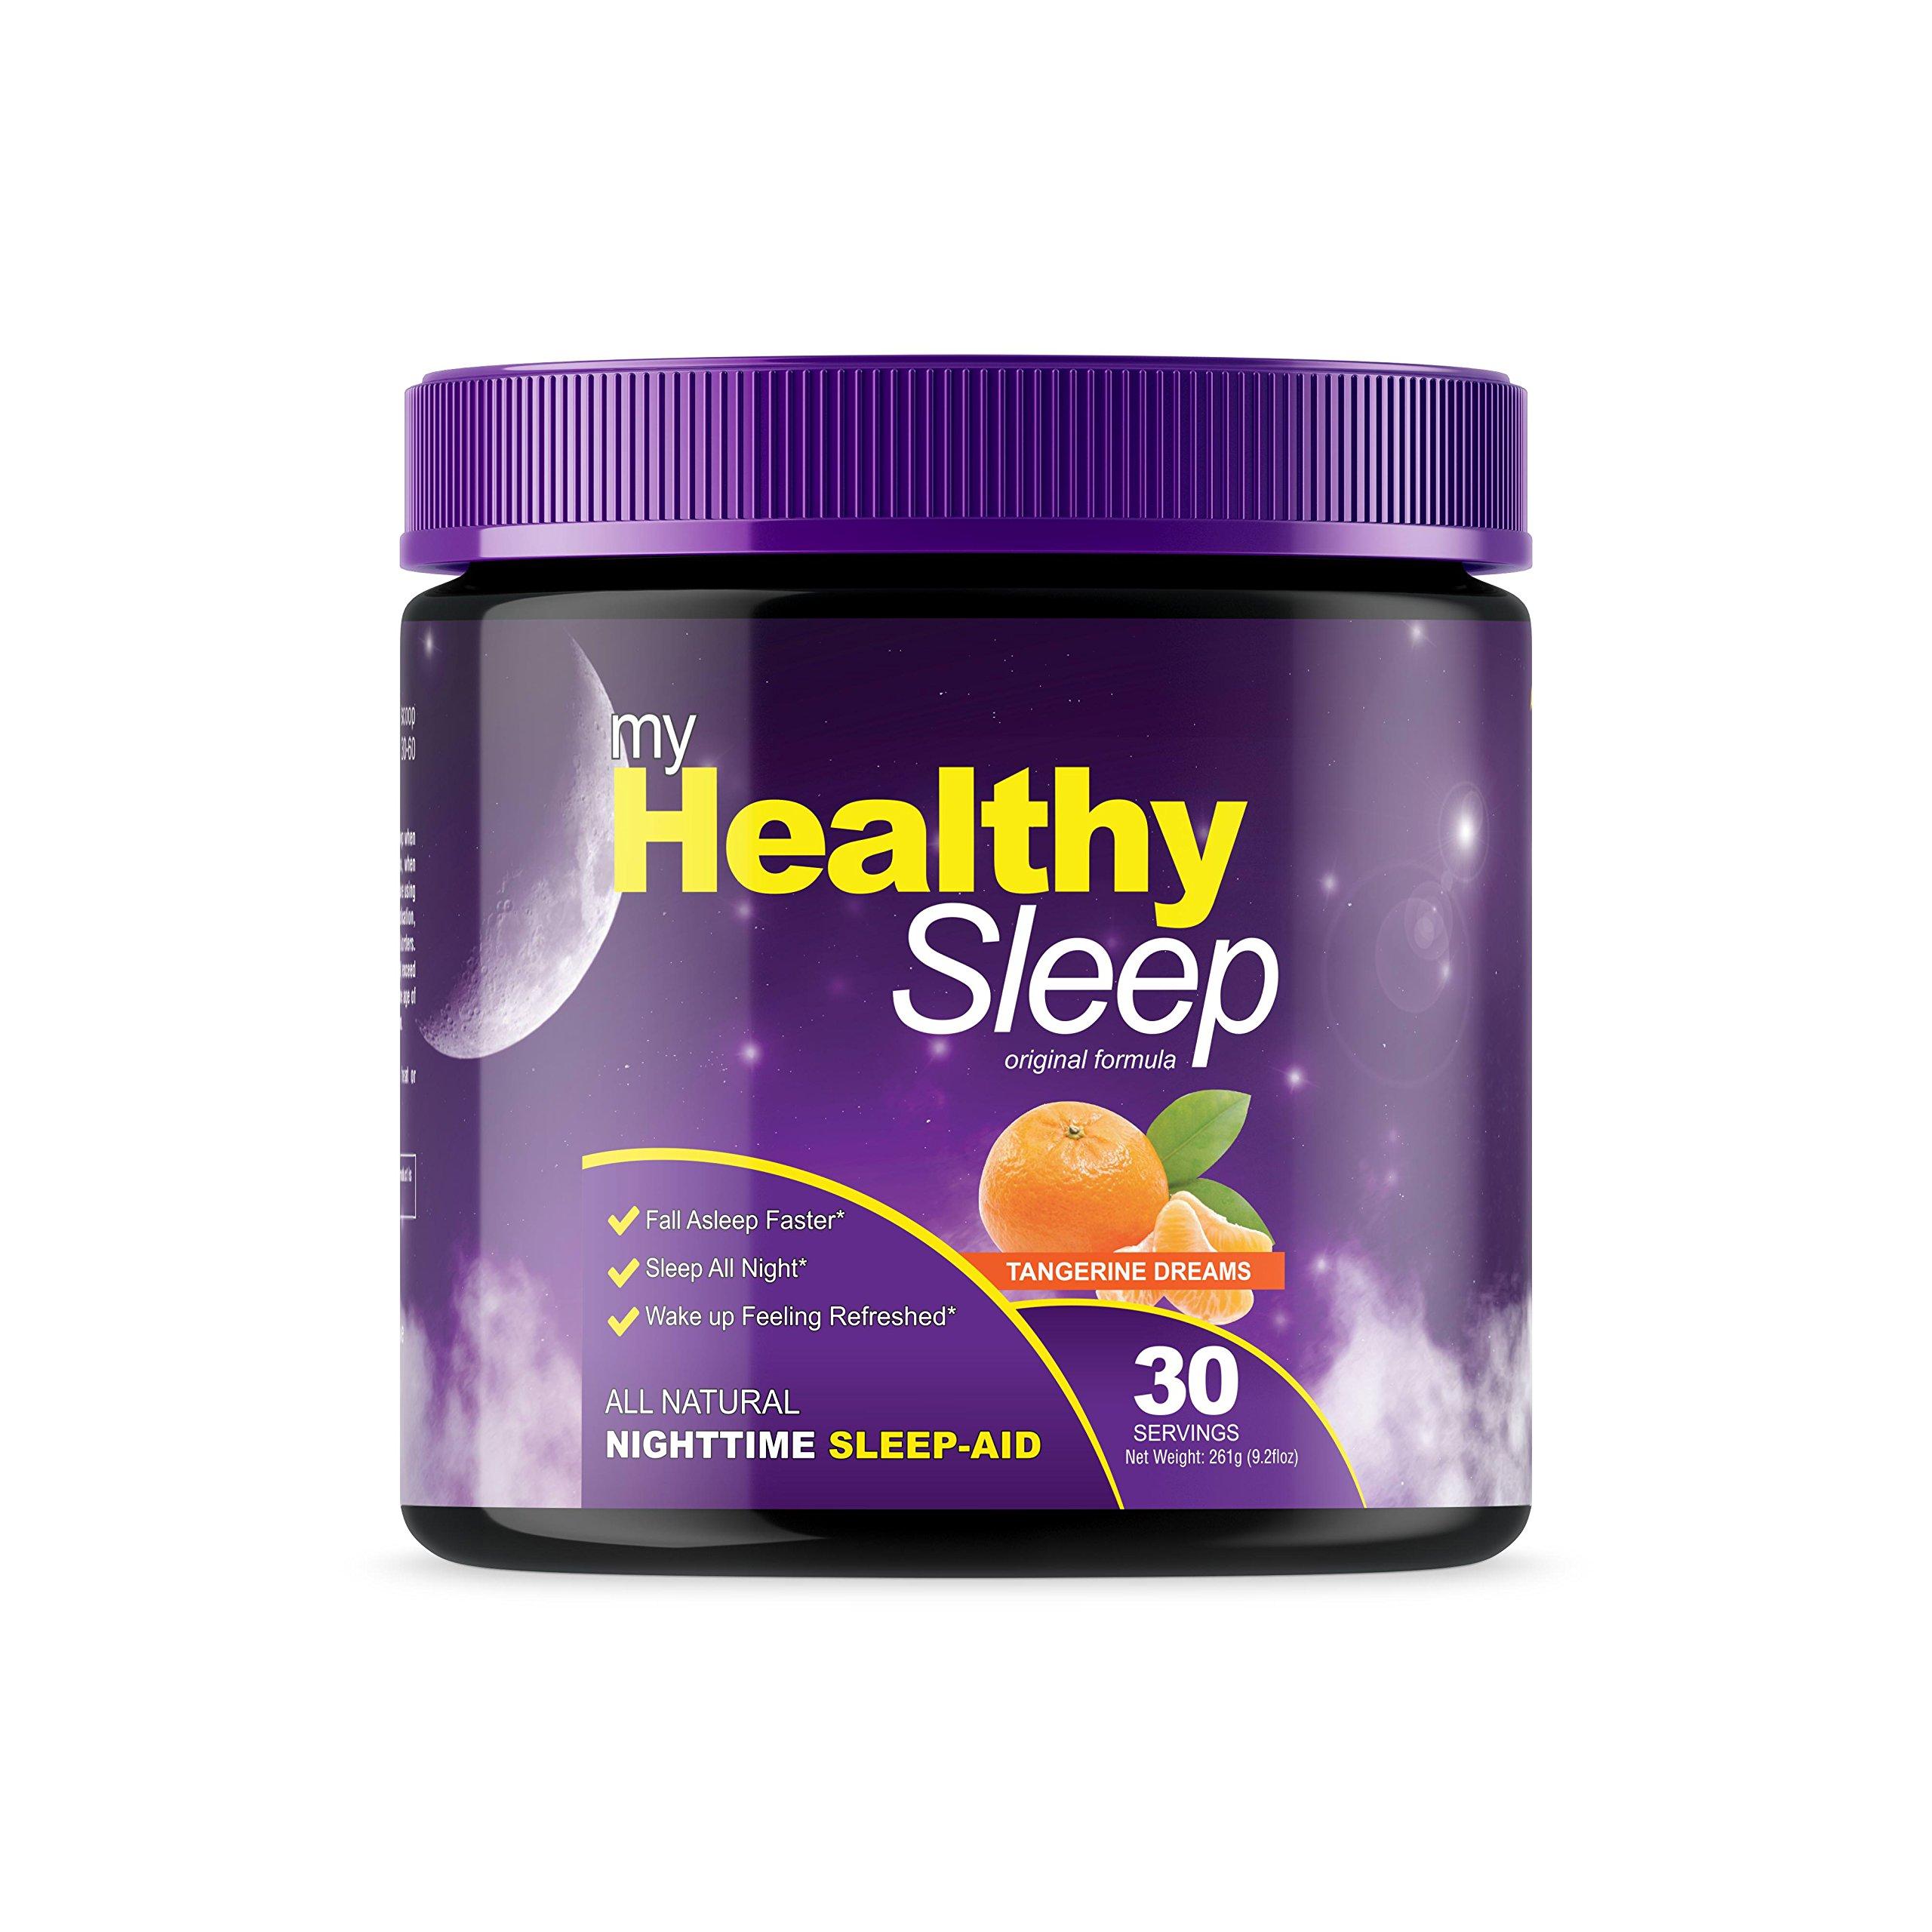 My Healthy Sleep - Natural Sleep-Aid, Sleep Supplement Powder - Contains Melatonin, L-Theanine, L-Tryptophan, Vitamin B6, Passion Flower, Ashwagandha Root, Magnolia Bark, and More! 30 Servings